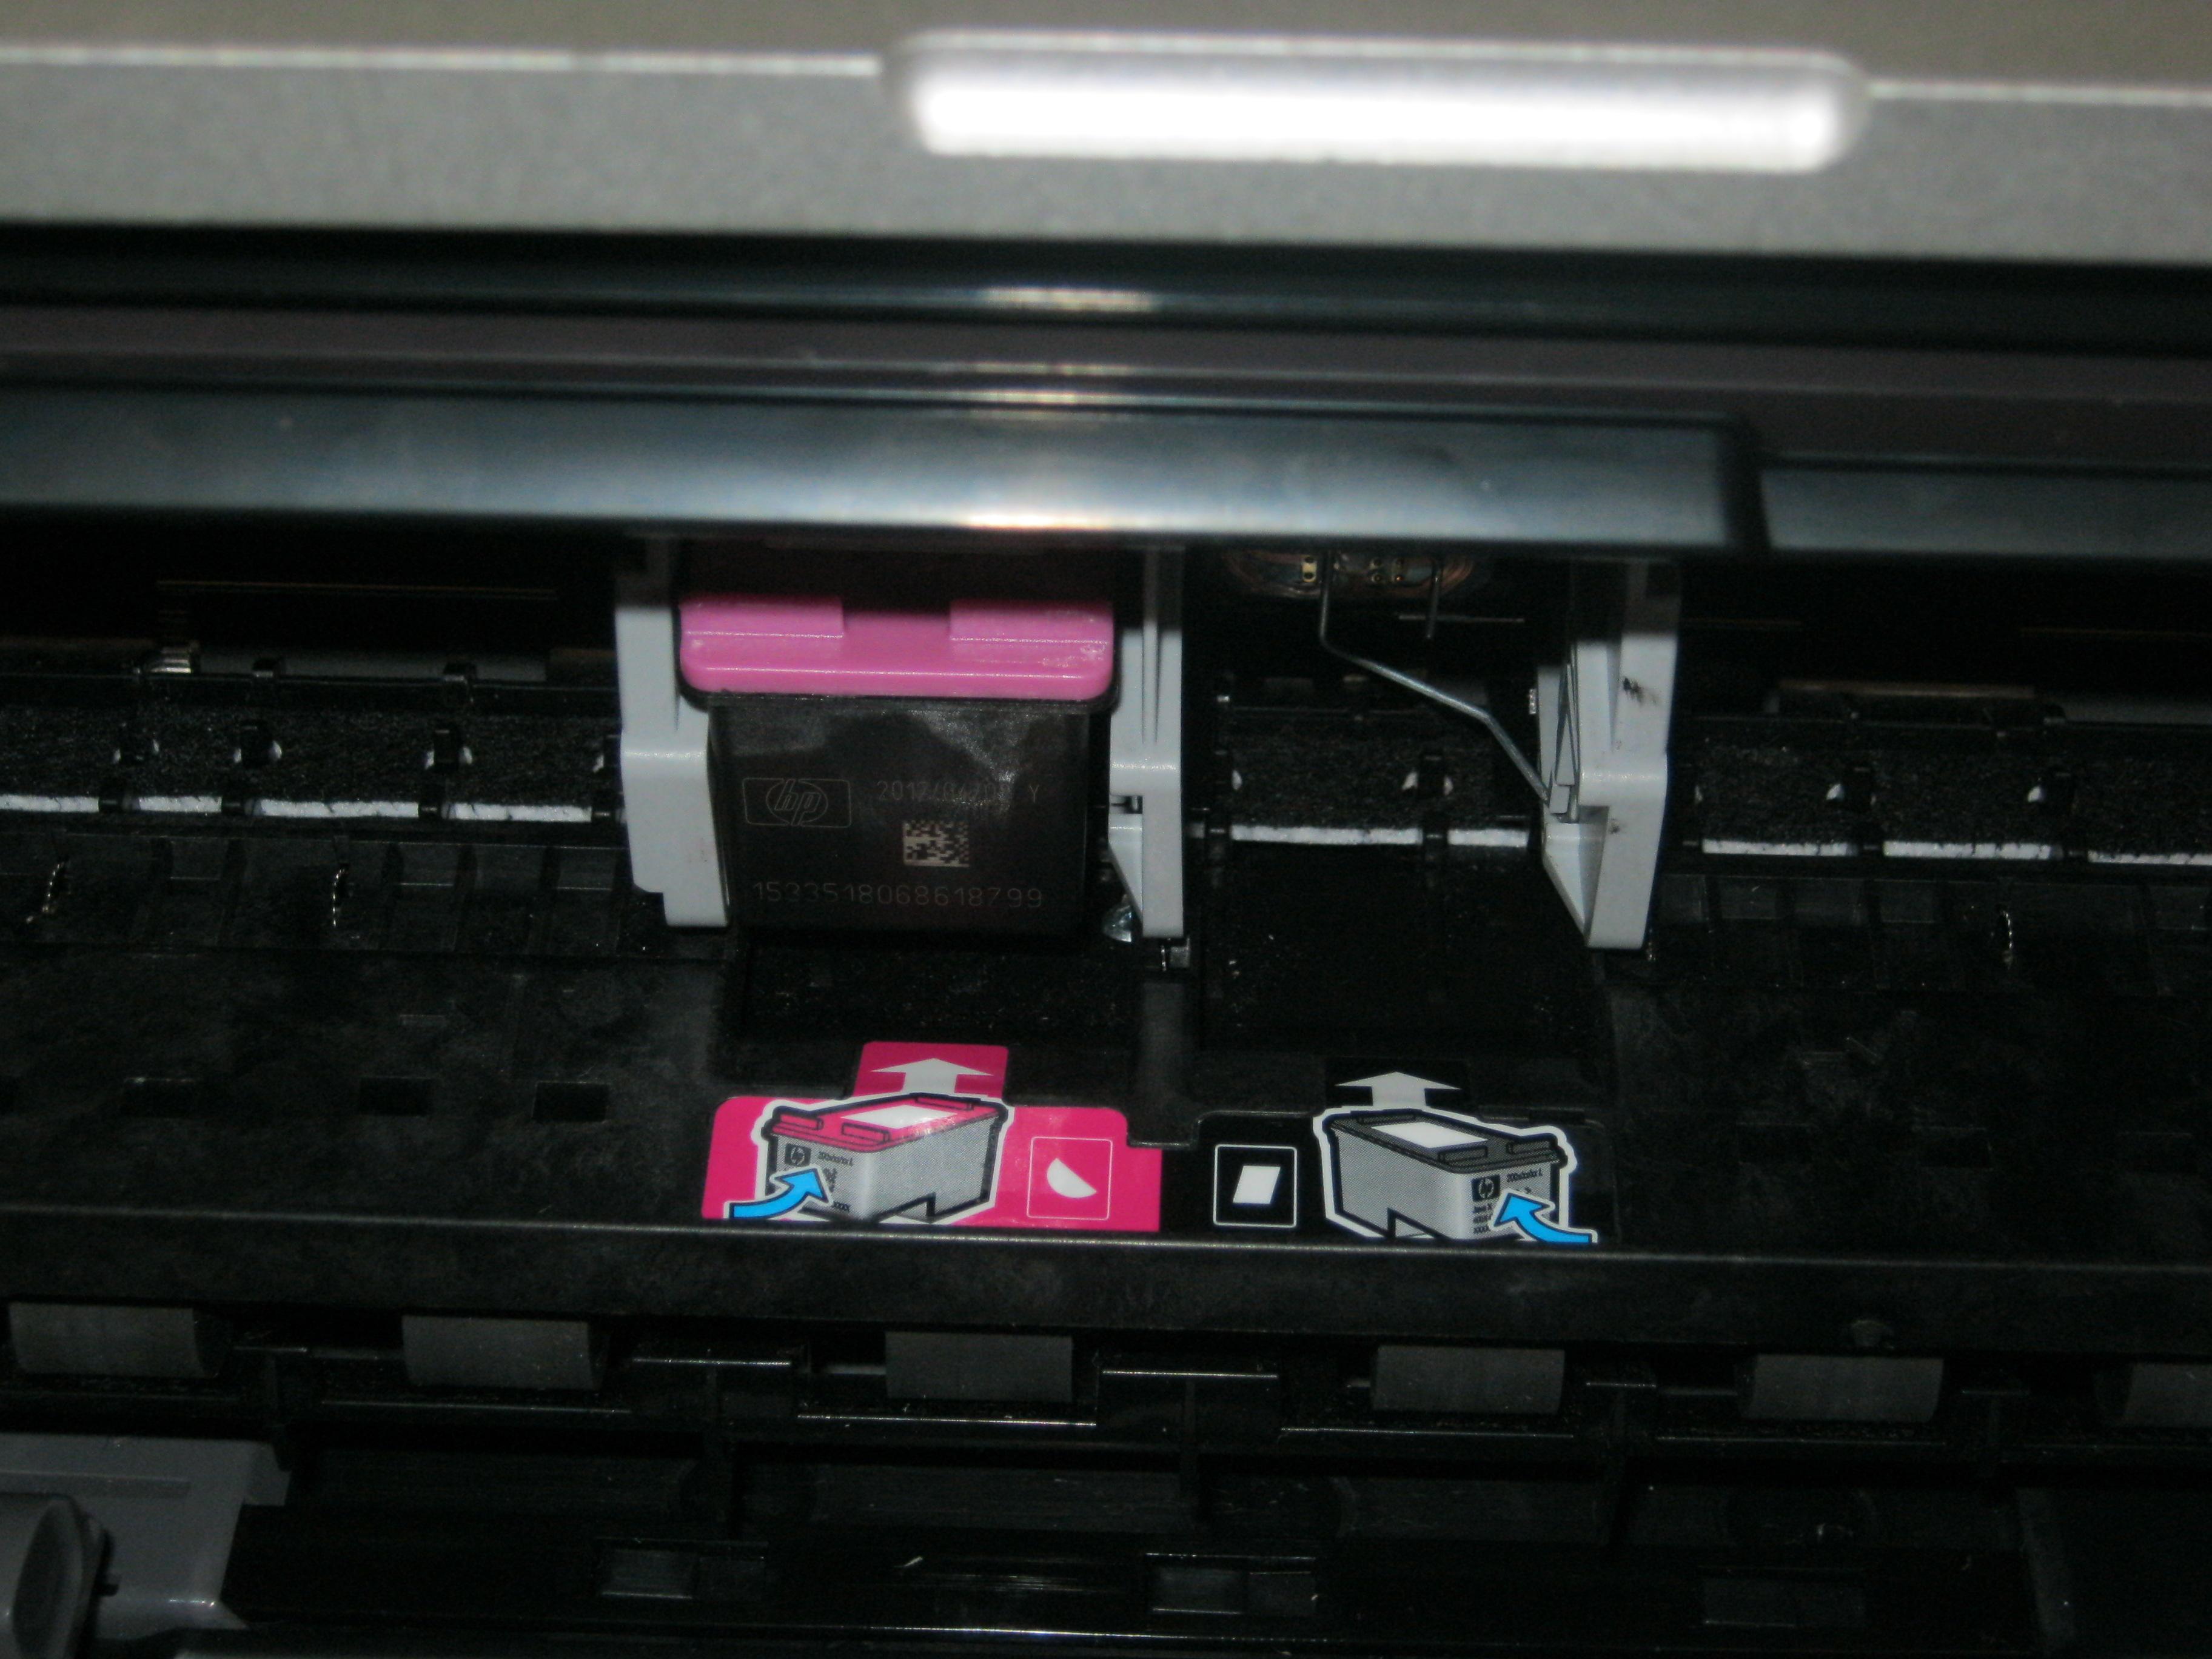 Driver for hp photosmart 7350 windows 7 M: HP PhotoSmart 7660 Inkjet Printer: Electronics